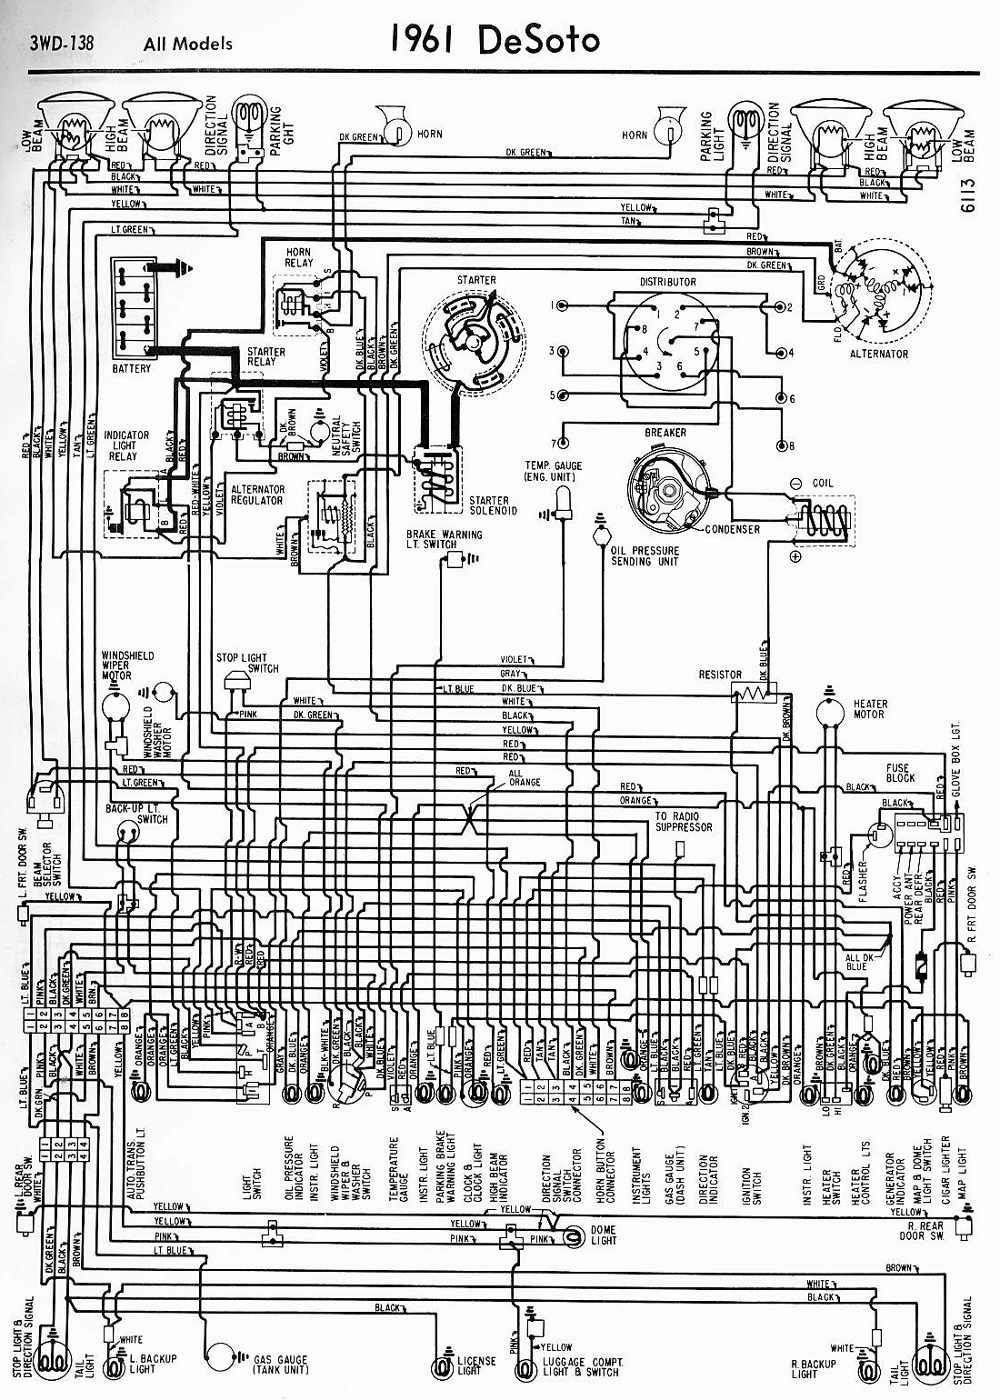 Beautiful 22re Msd 6a Wiring Diagram Embellishment - Wiring Diagram ...